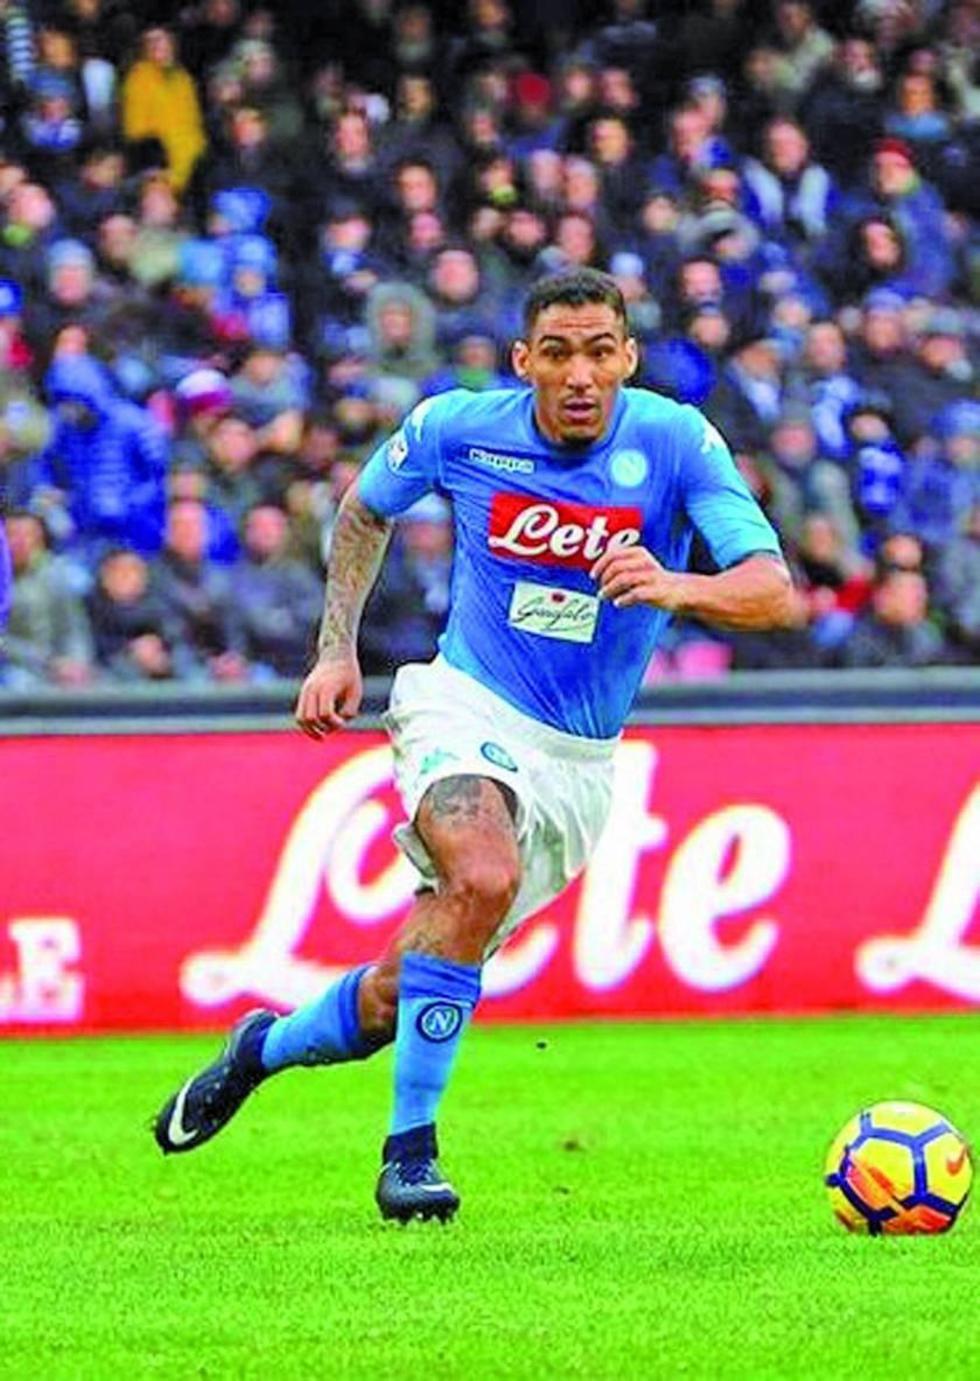 Nápoles se coloca líder de la liga italiana